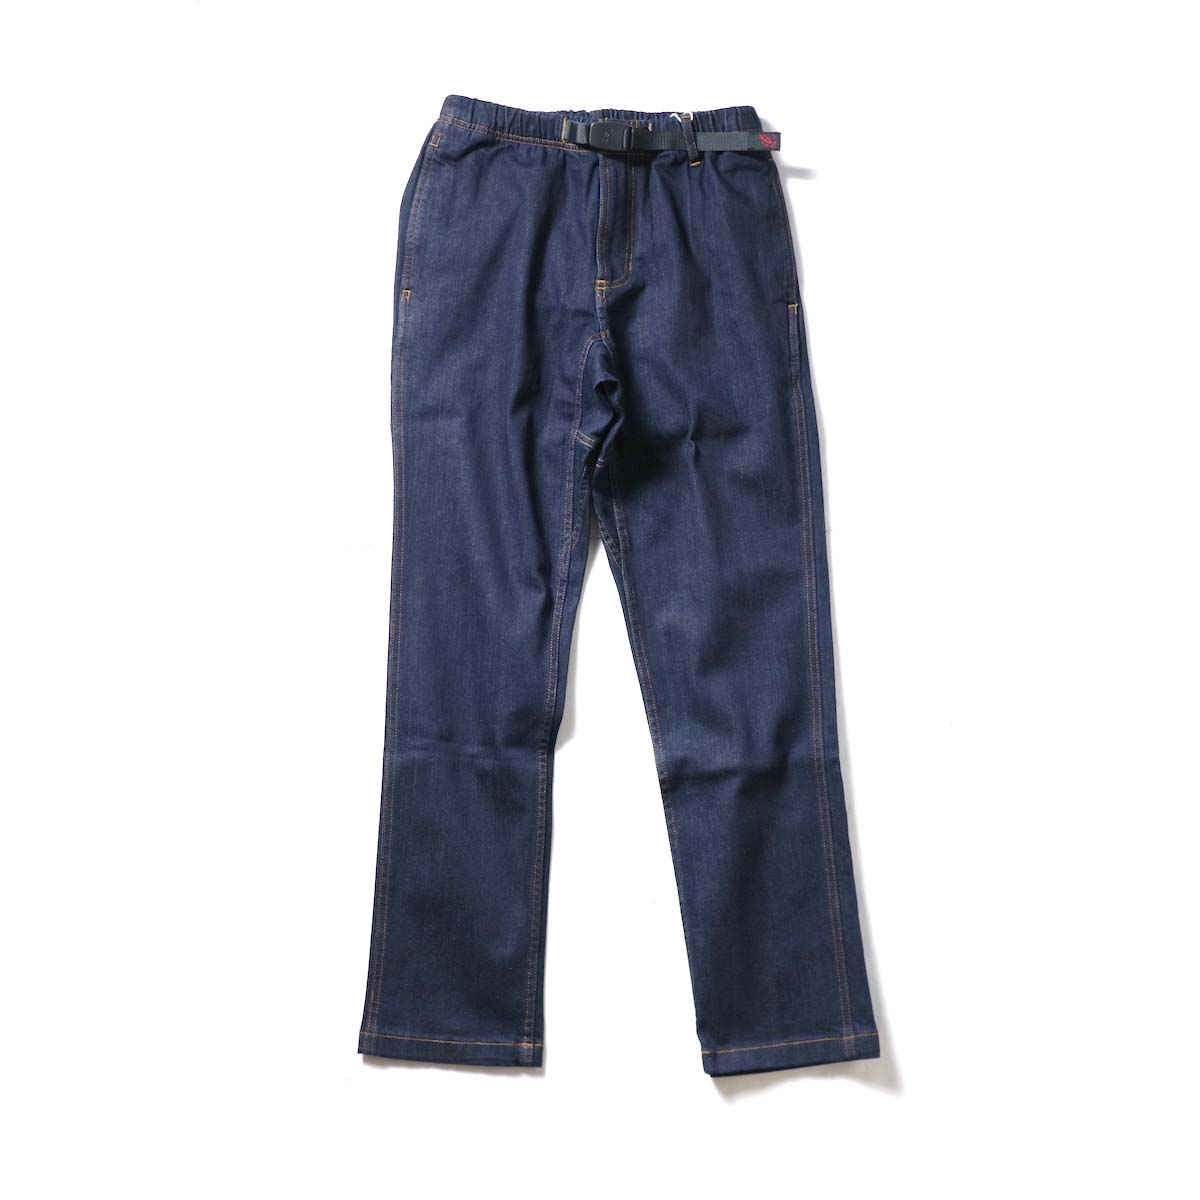 GRAMICCI / DENIM NN-PANTS JUST CUT (One Wash)